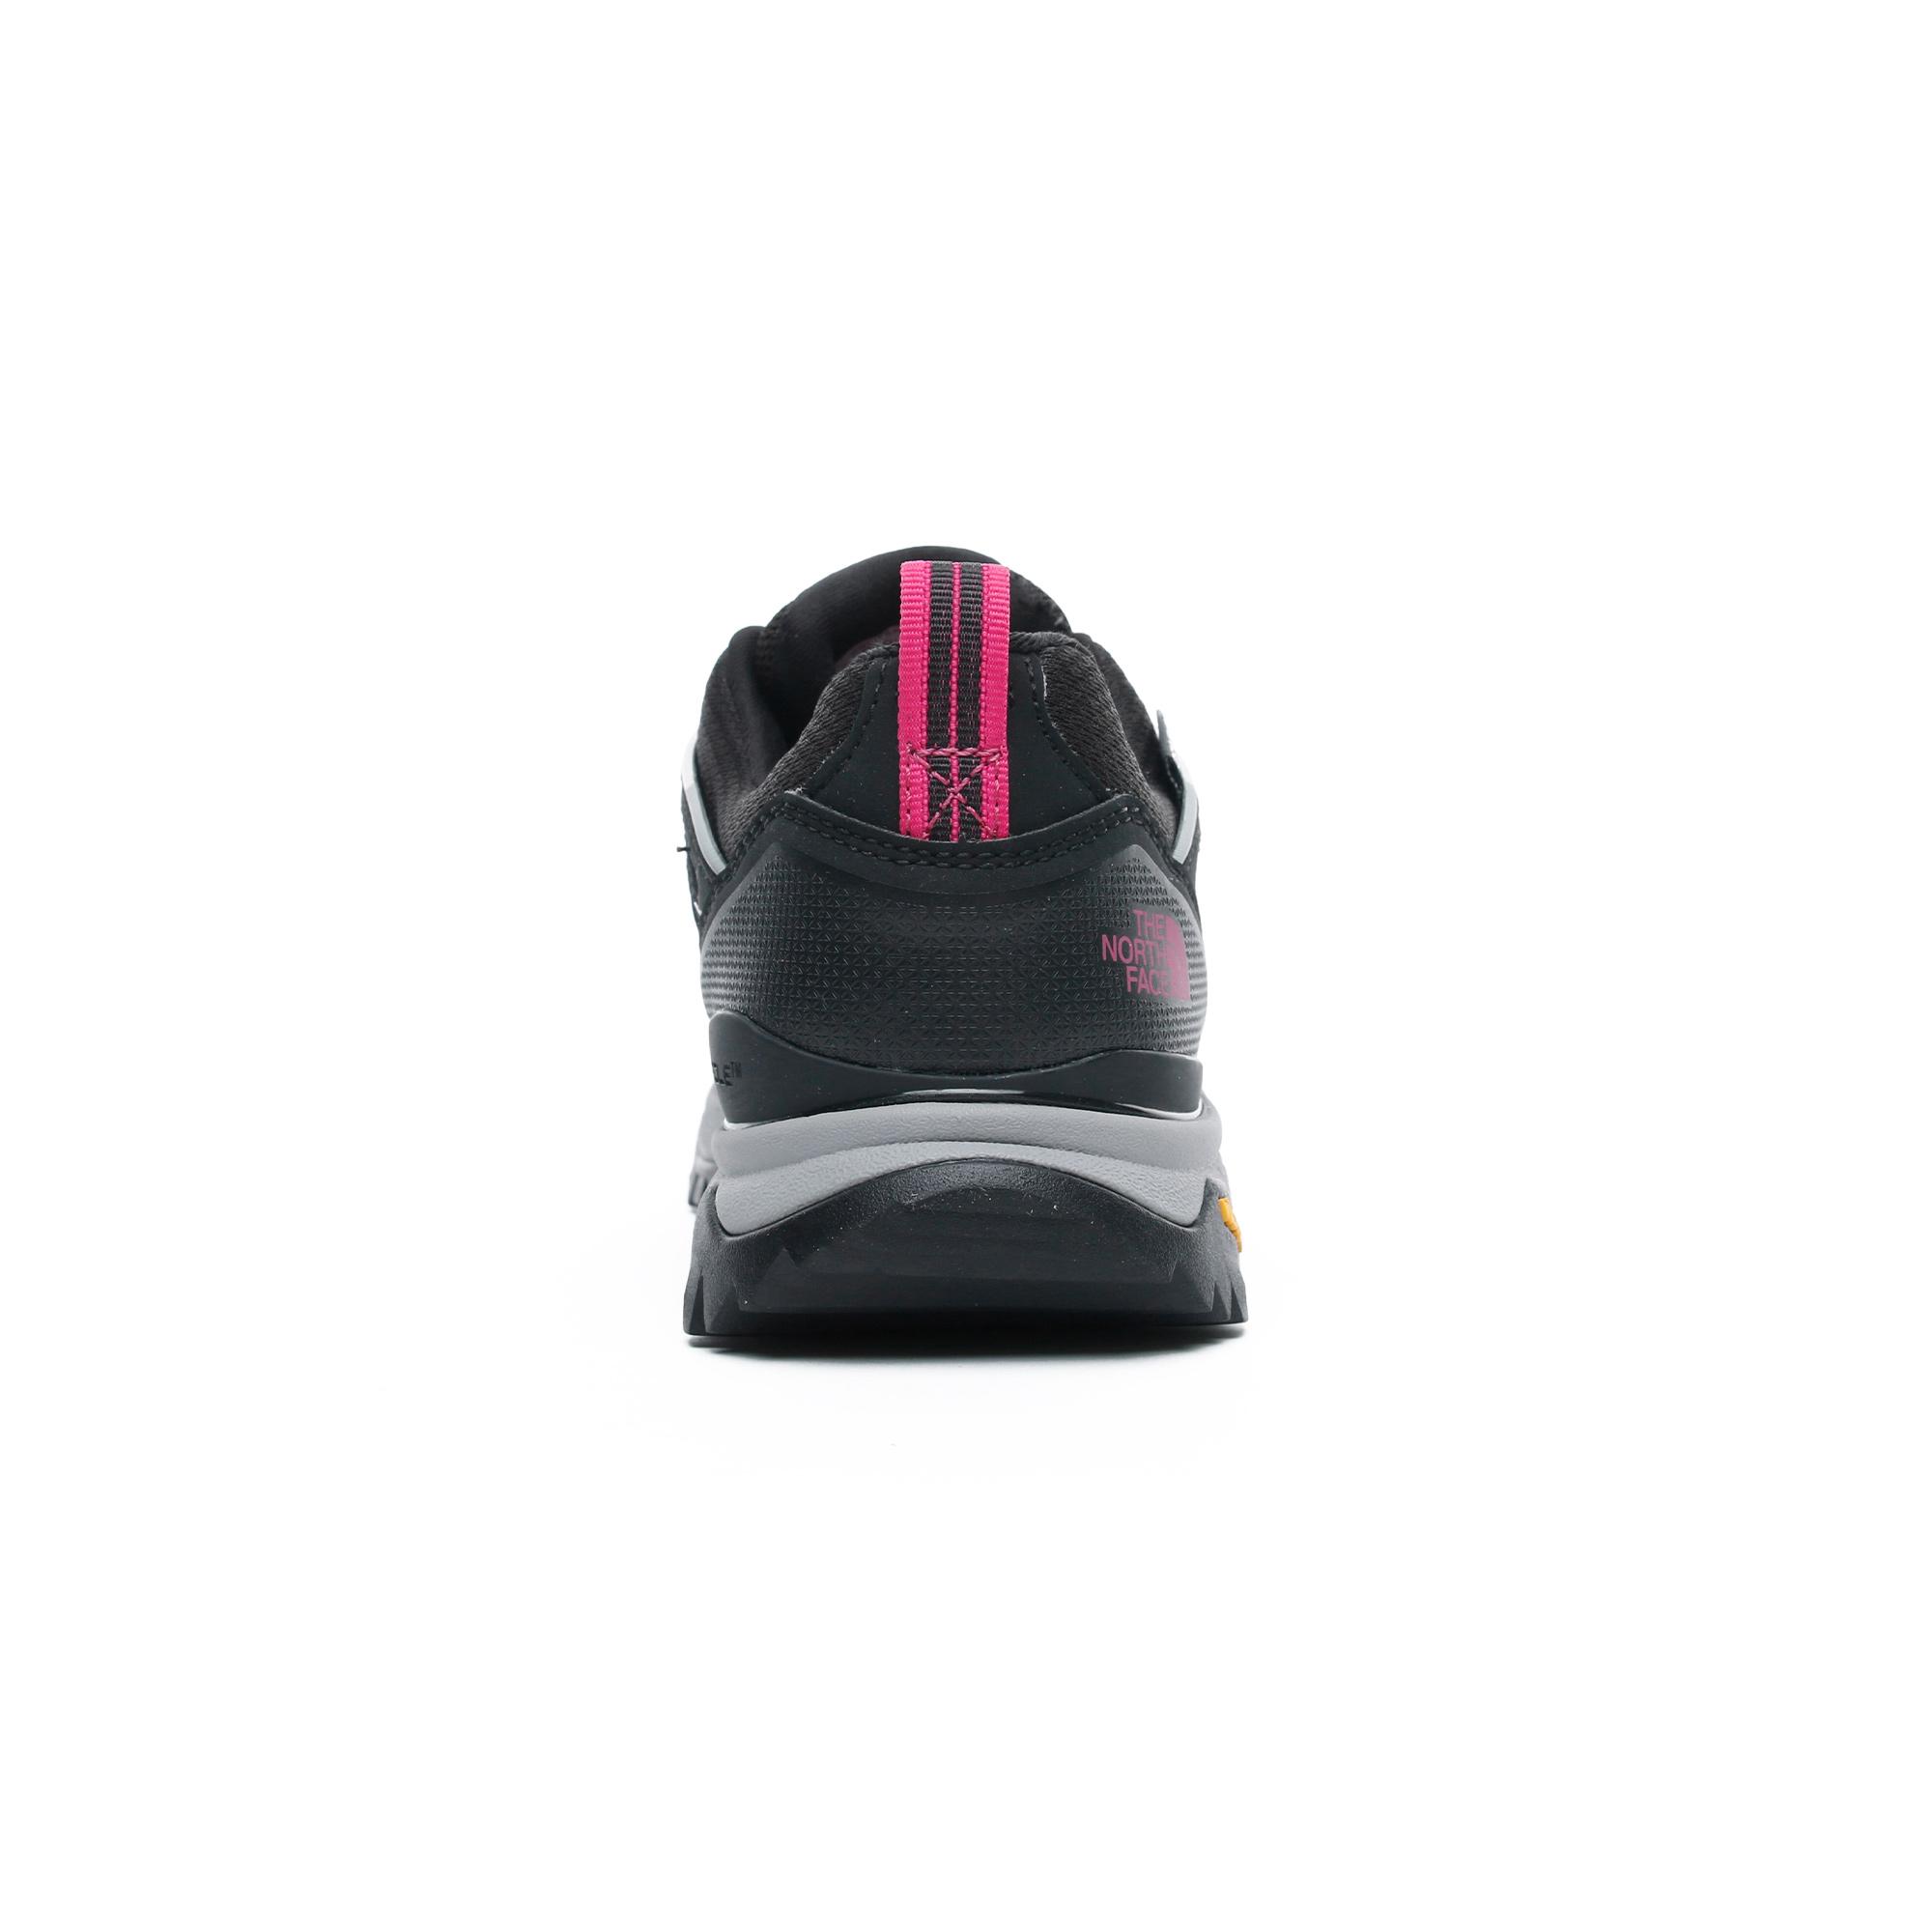 The North Face Hedgehog Fastpack II Wp Kadın Siyah Spor Ayakkabı